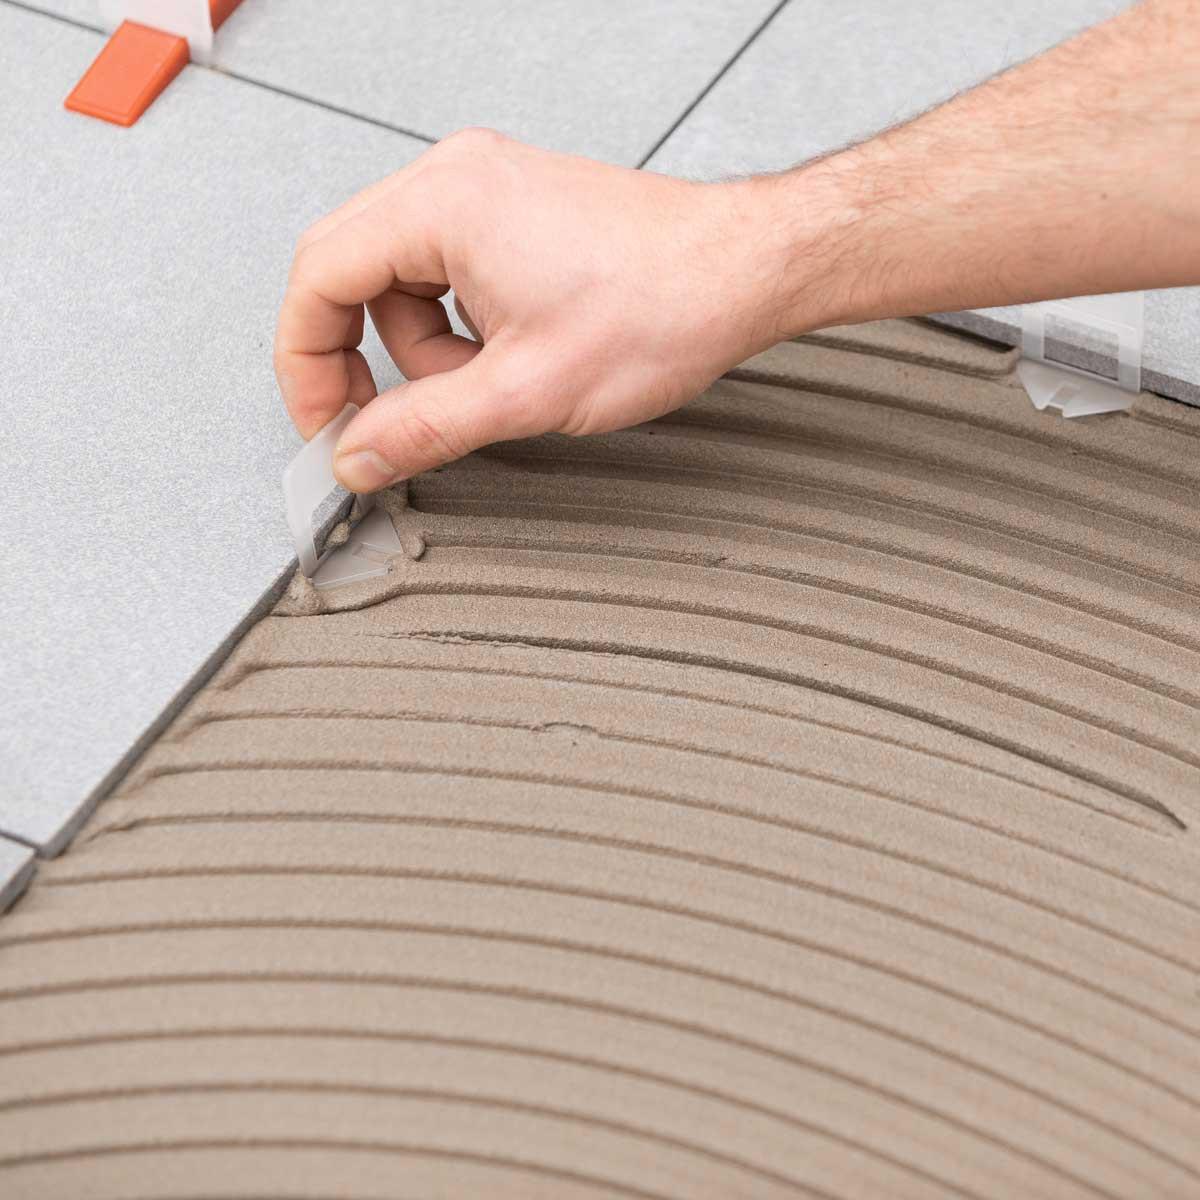 raimondi 1/16in large white clip installing with tile